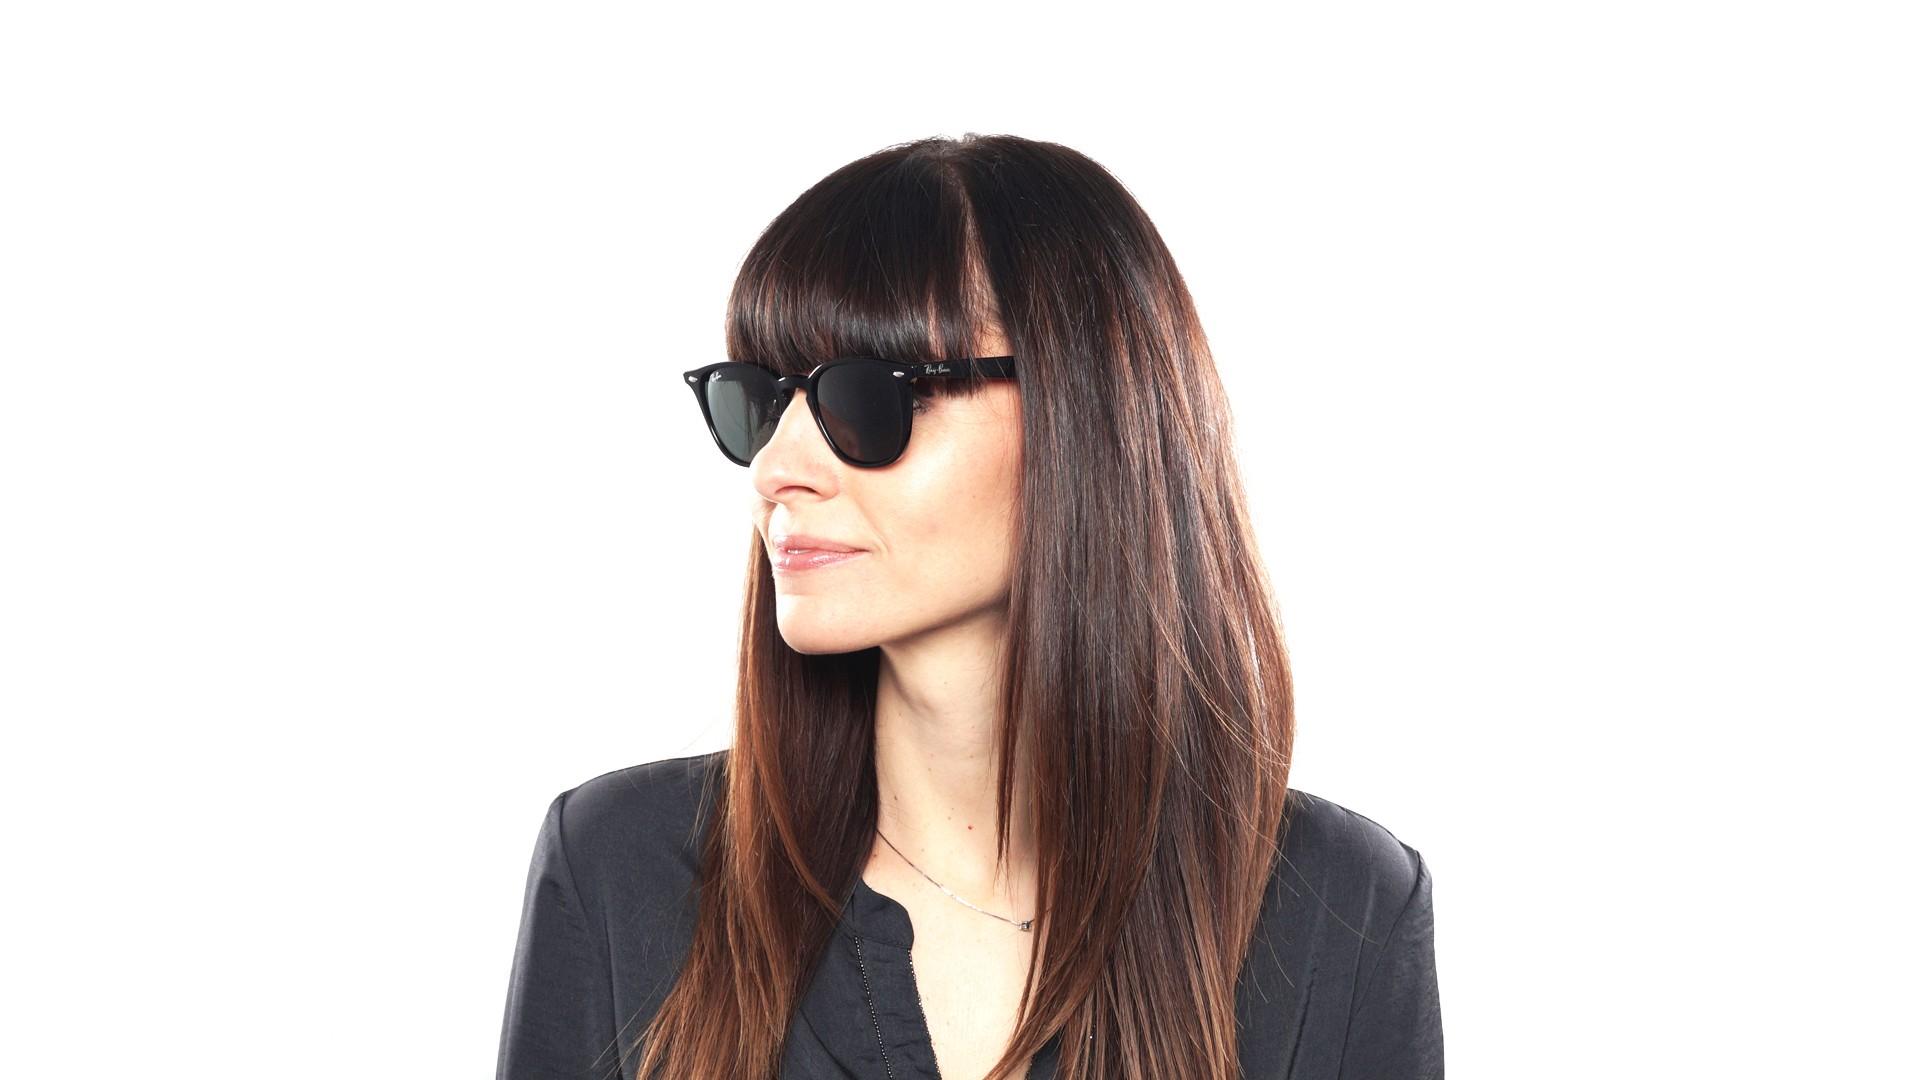 373c61b06e4 Sunglasses Ray-Ban RB4258 601 71 50-20 Black Medium